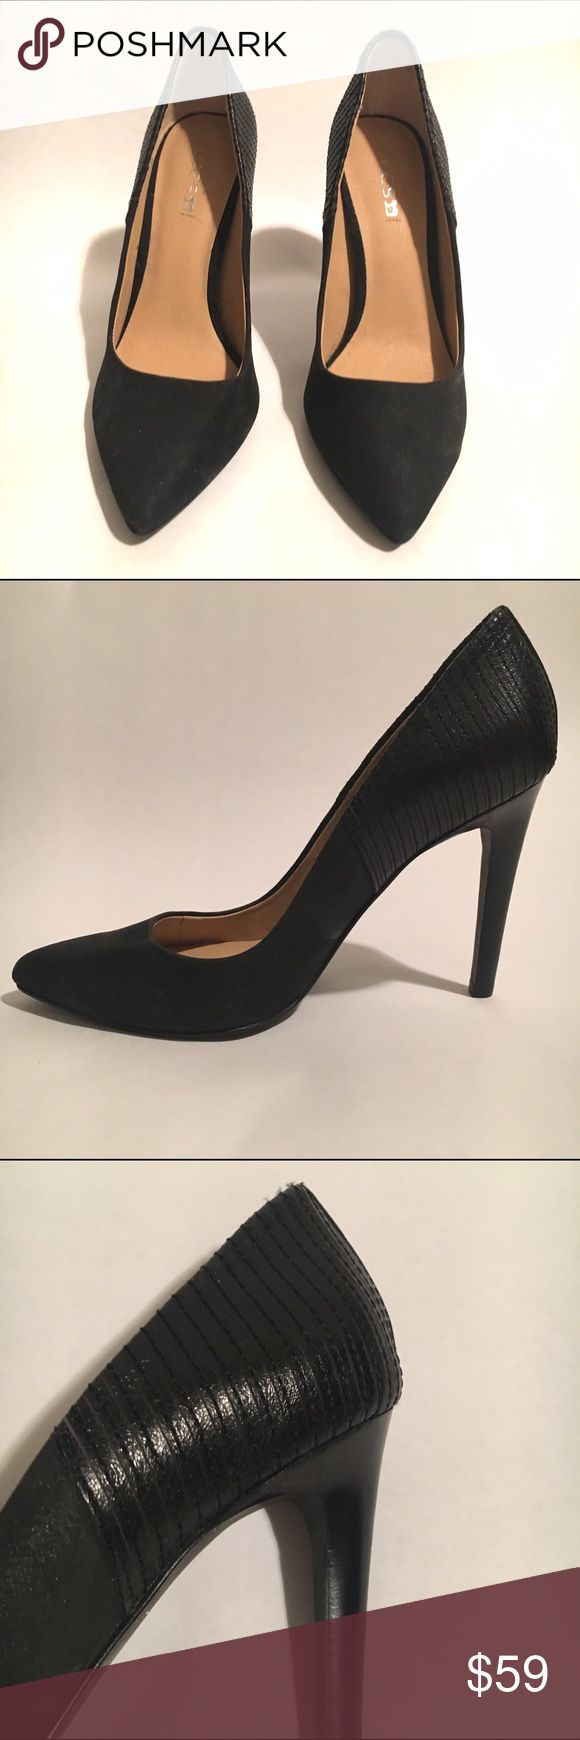 "JOE'S JEANS Black Suede Pumps Size 6 JOE'S JEANS black suede pumps. 4"" inch heels. Never worn. Joe's Jeans Shoes Heels"